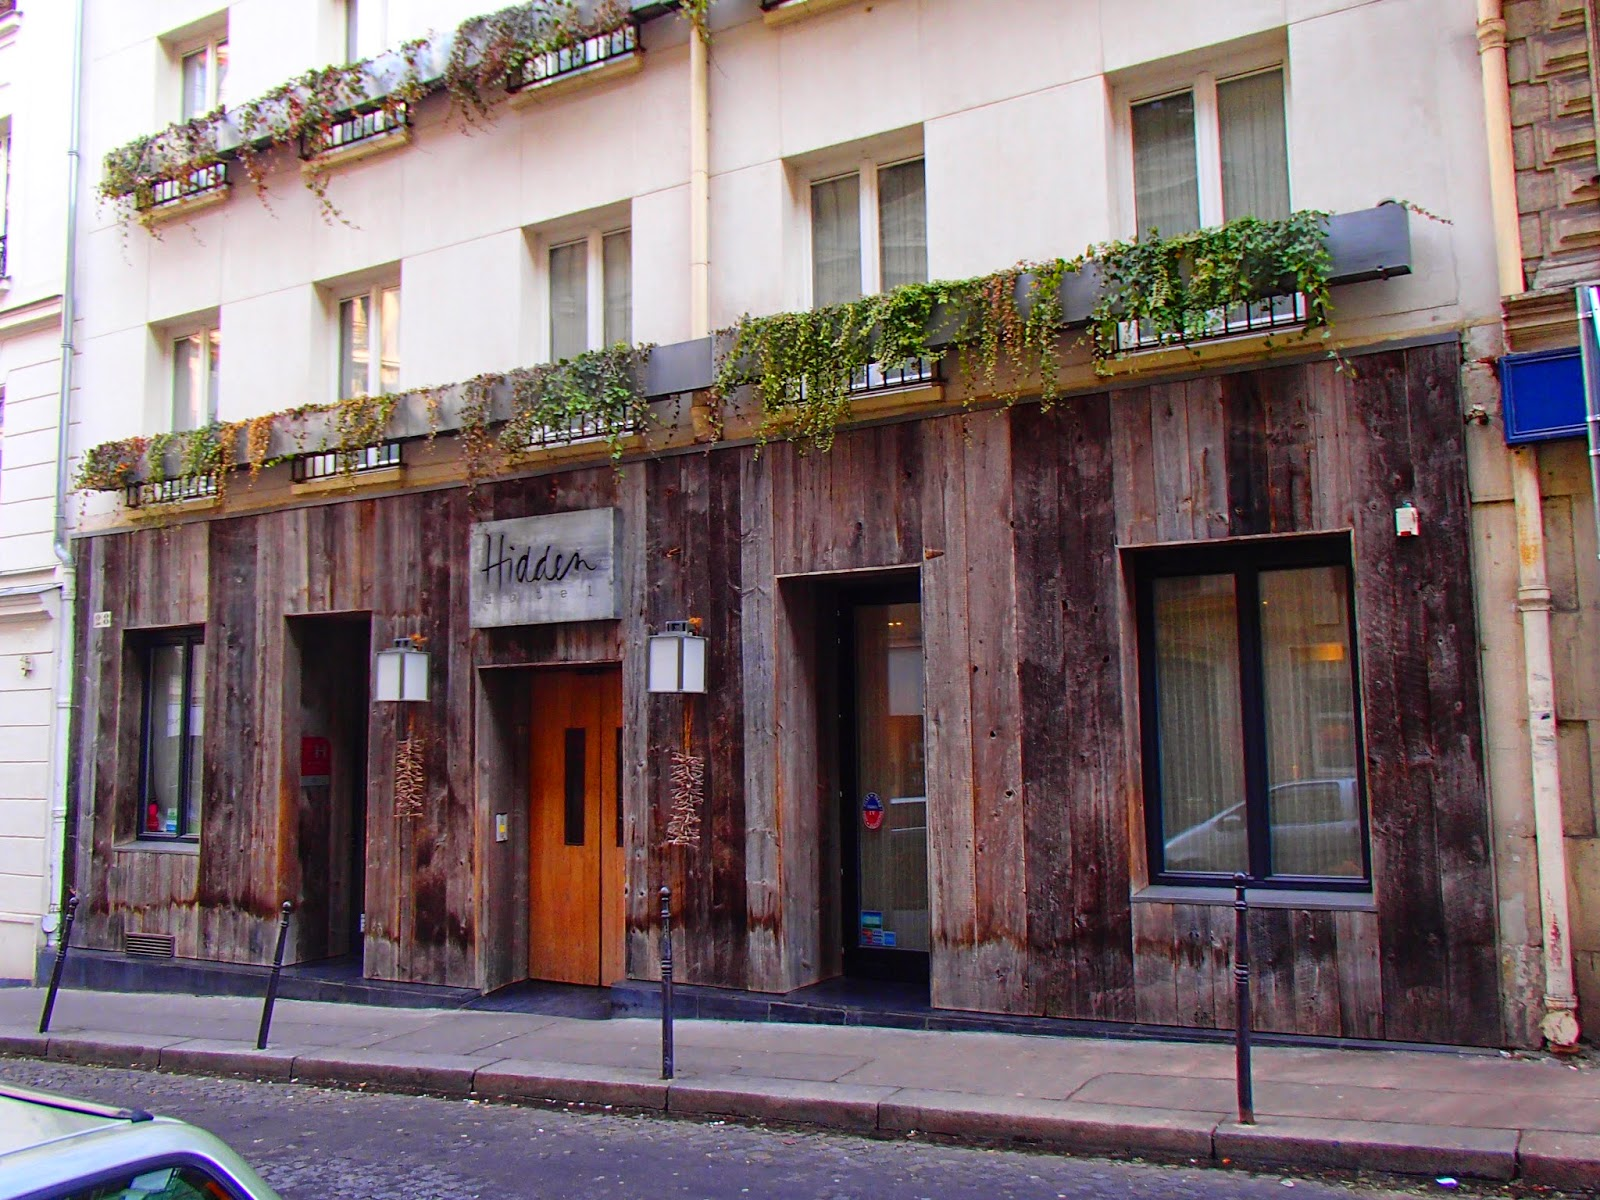 https://www.theaussieflashpacker.com/2015/02/luxury-hotel-review-hidden-hotel-paris.html